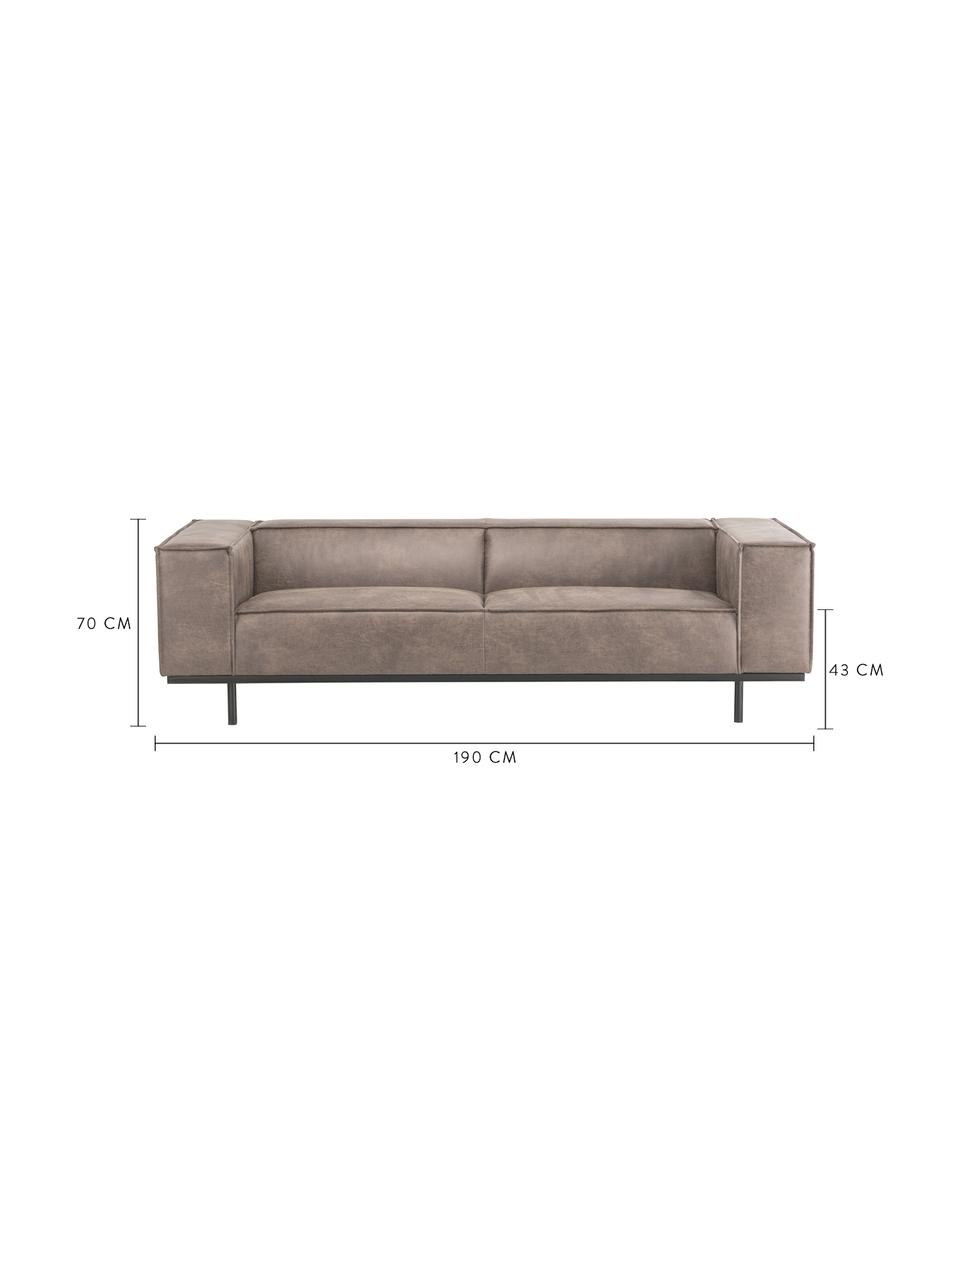 Leder-Sofa Abigail (2-Sitzer) in Cognacfarben mit Metall-Füßen, Bezug: Lederfaserstoff (70% Lede, Beine: Stahl, lackiert, Leder Cognac, B 190 x T 95 cm